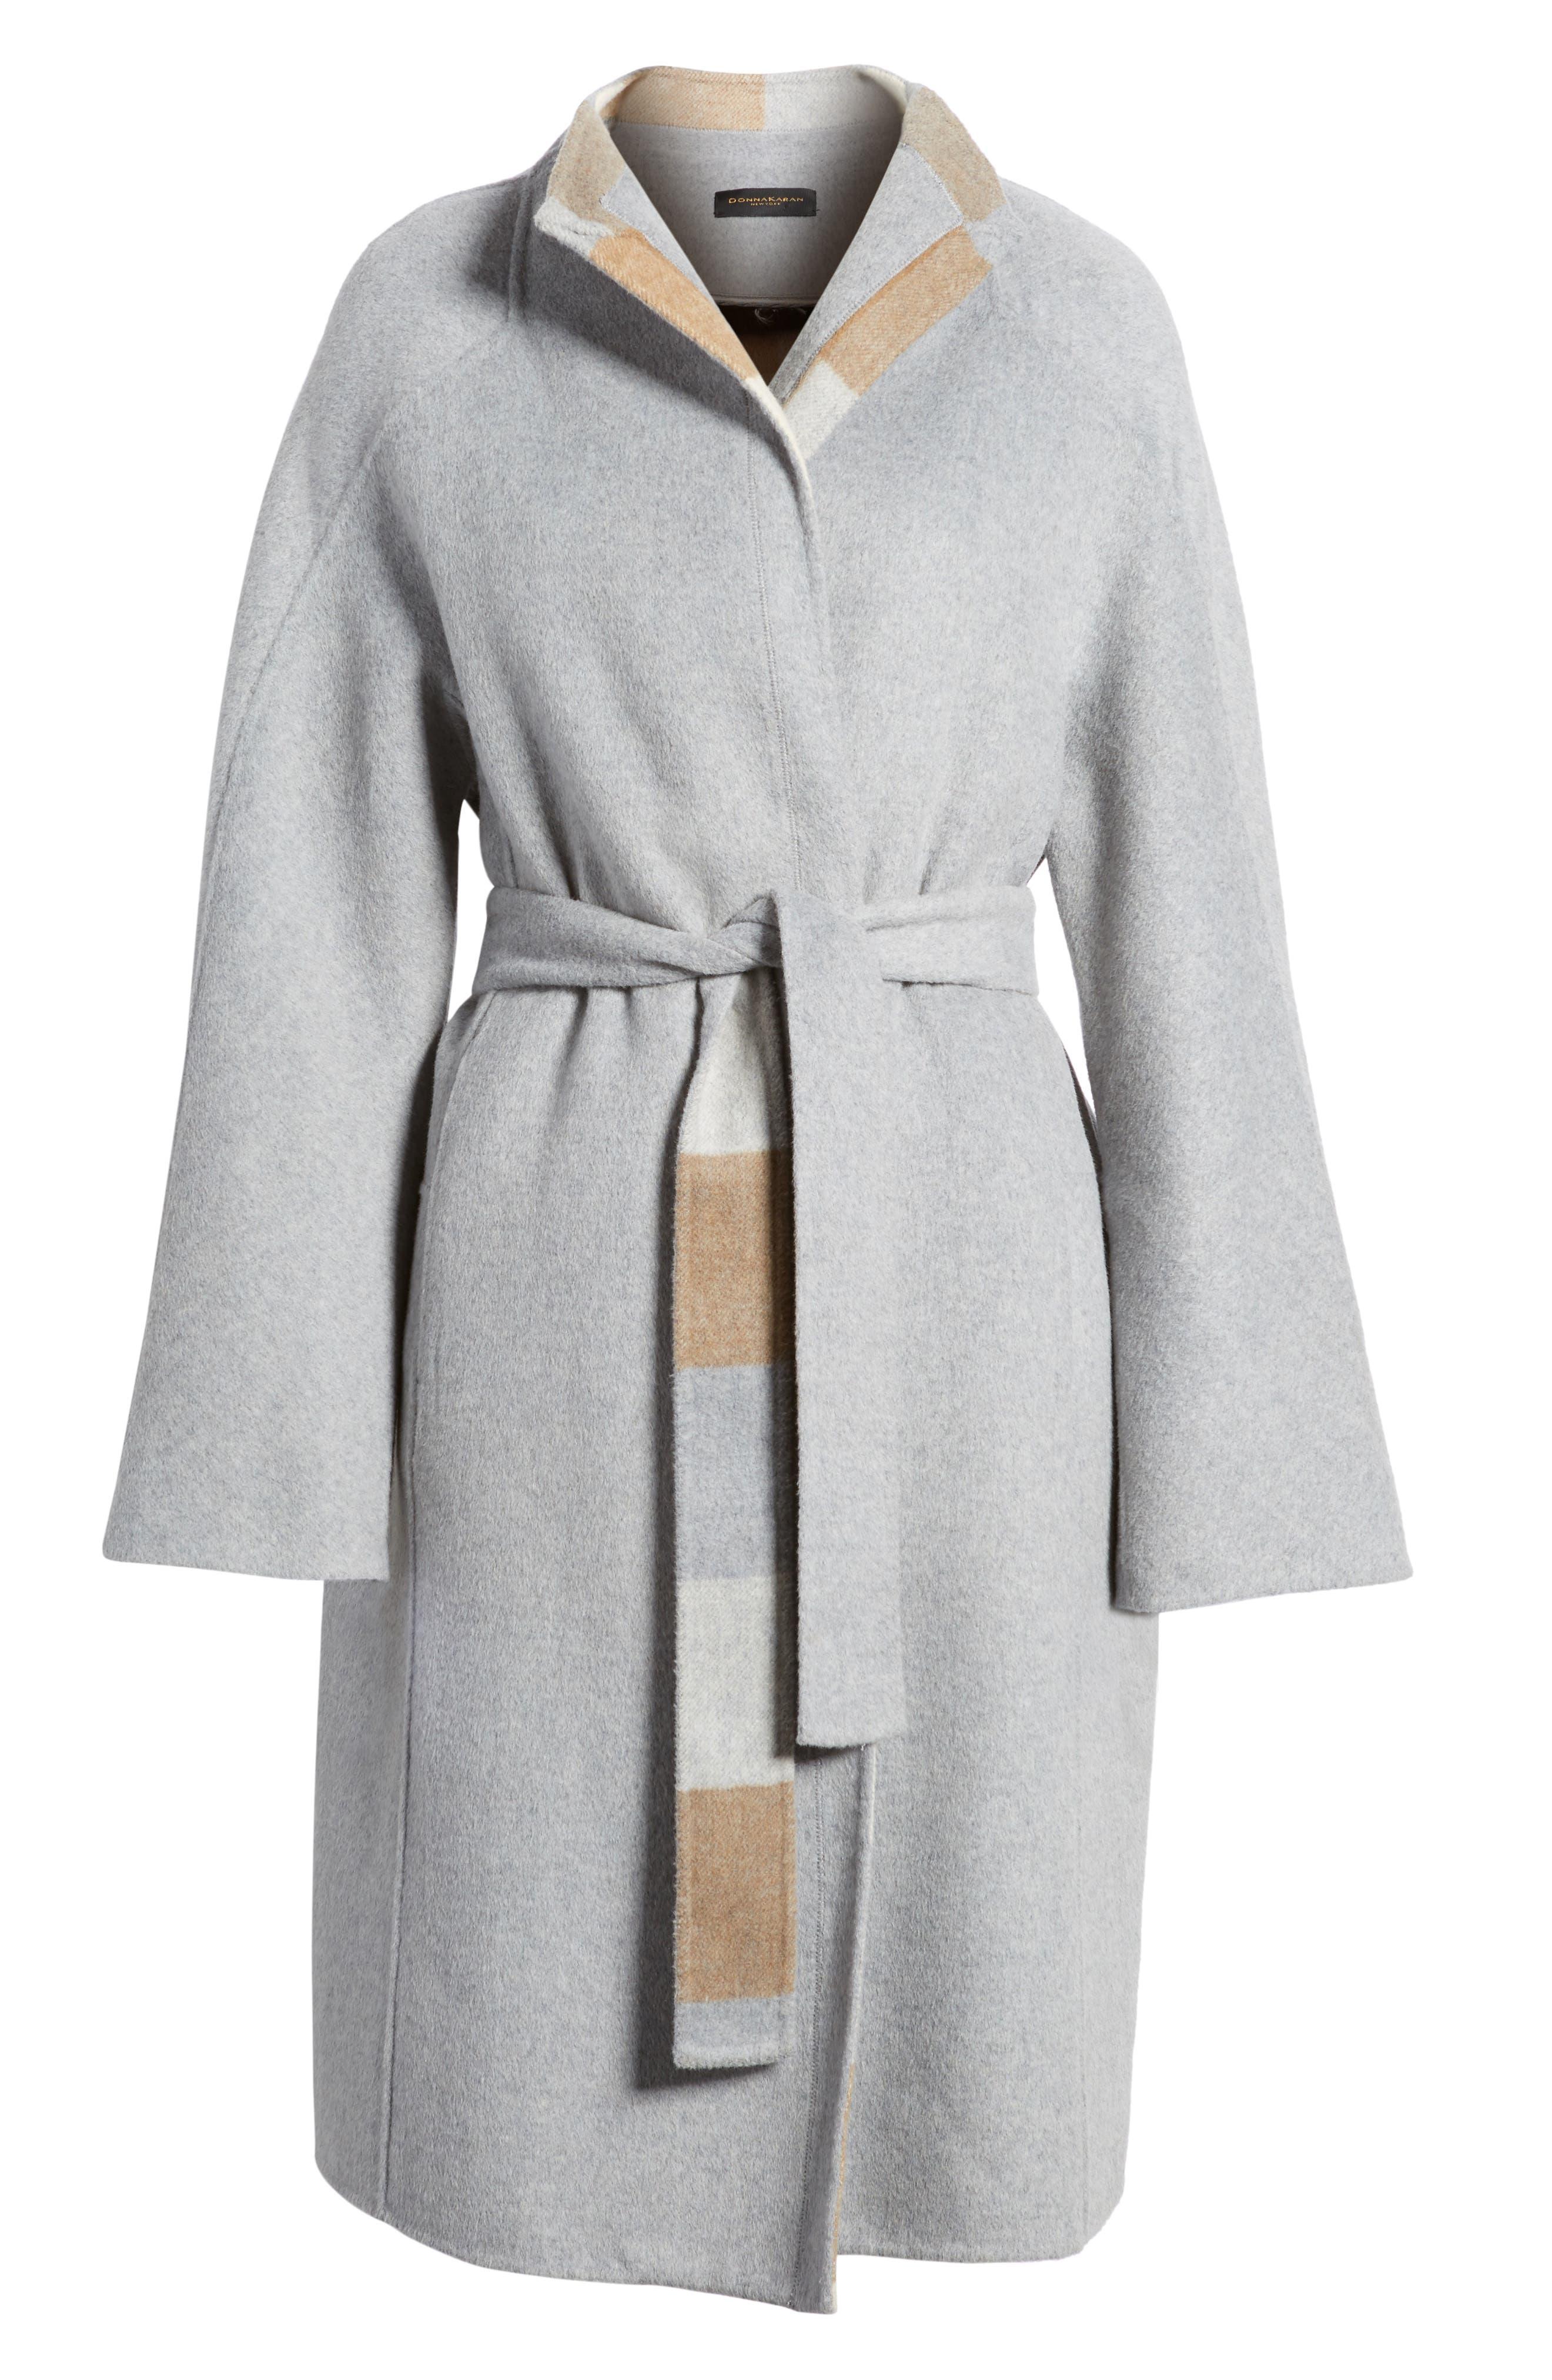 DKNY Wool Blend Wrap Coat,                             Alternate thumbnail 5, color,